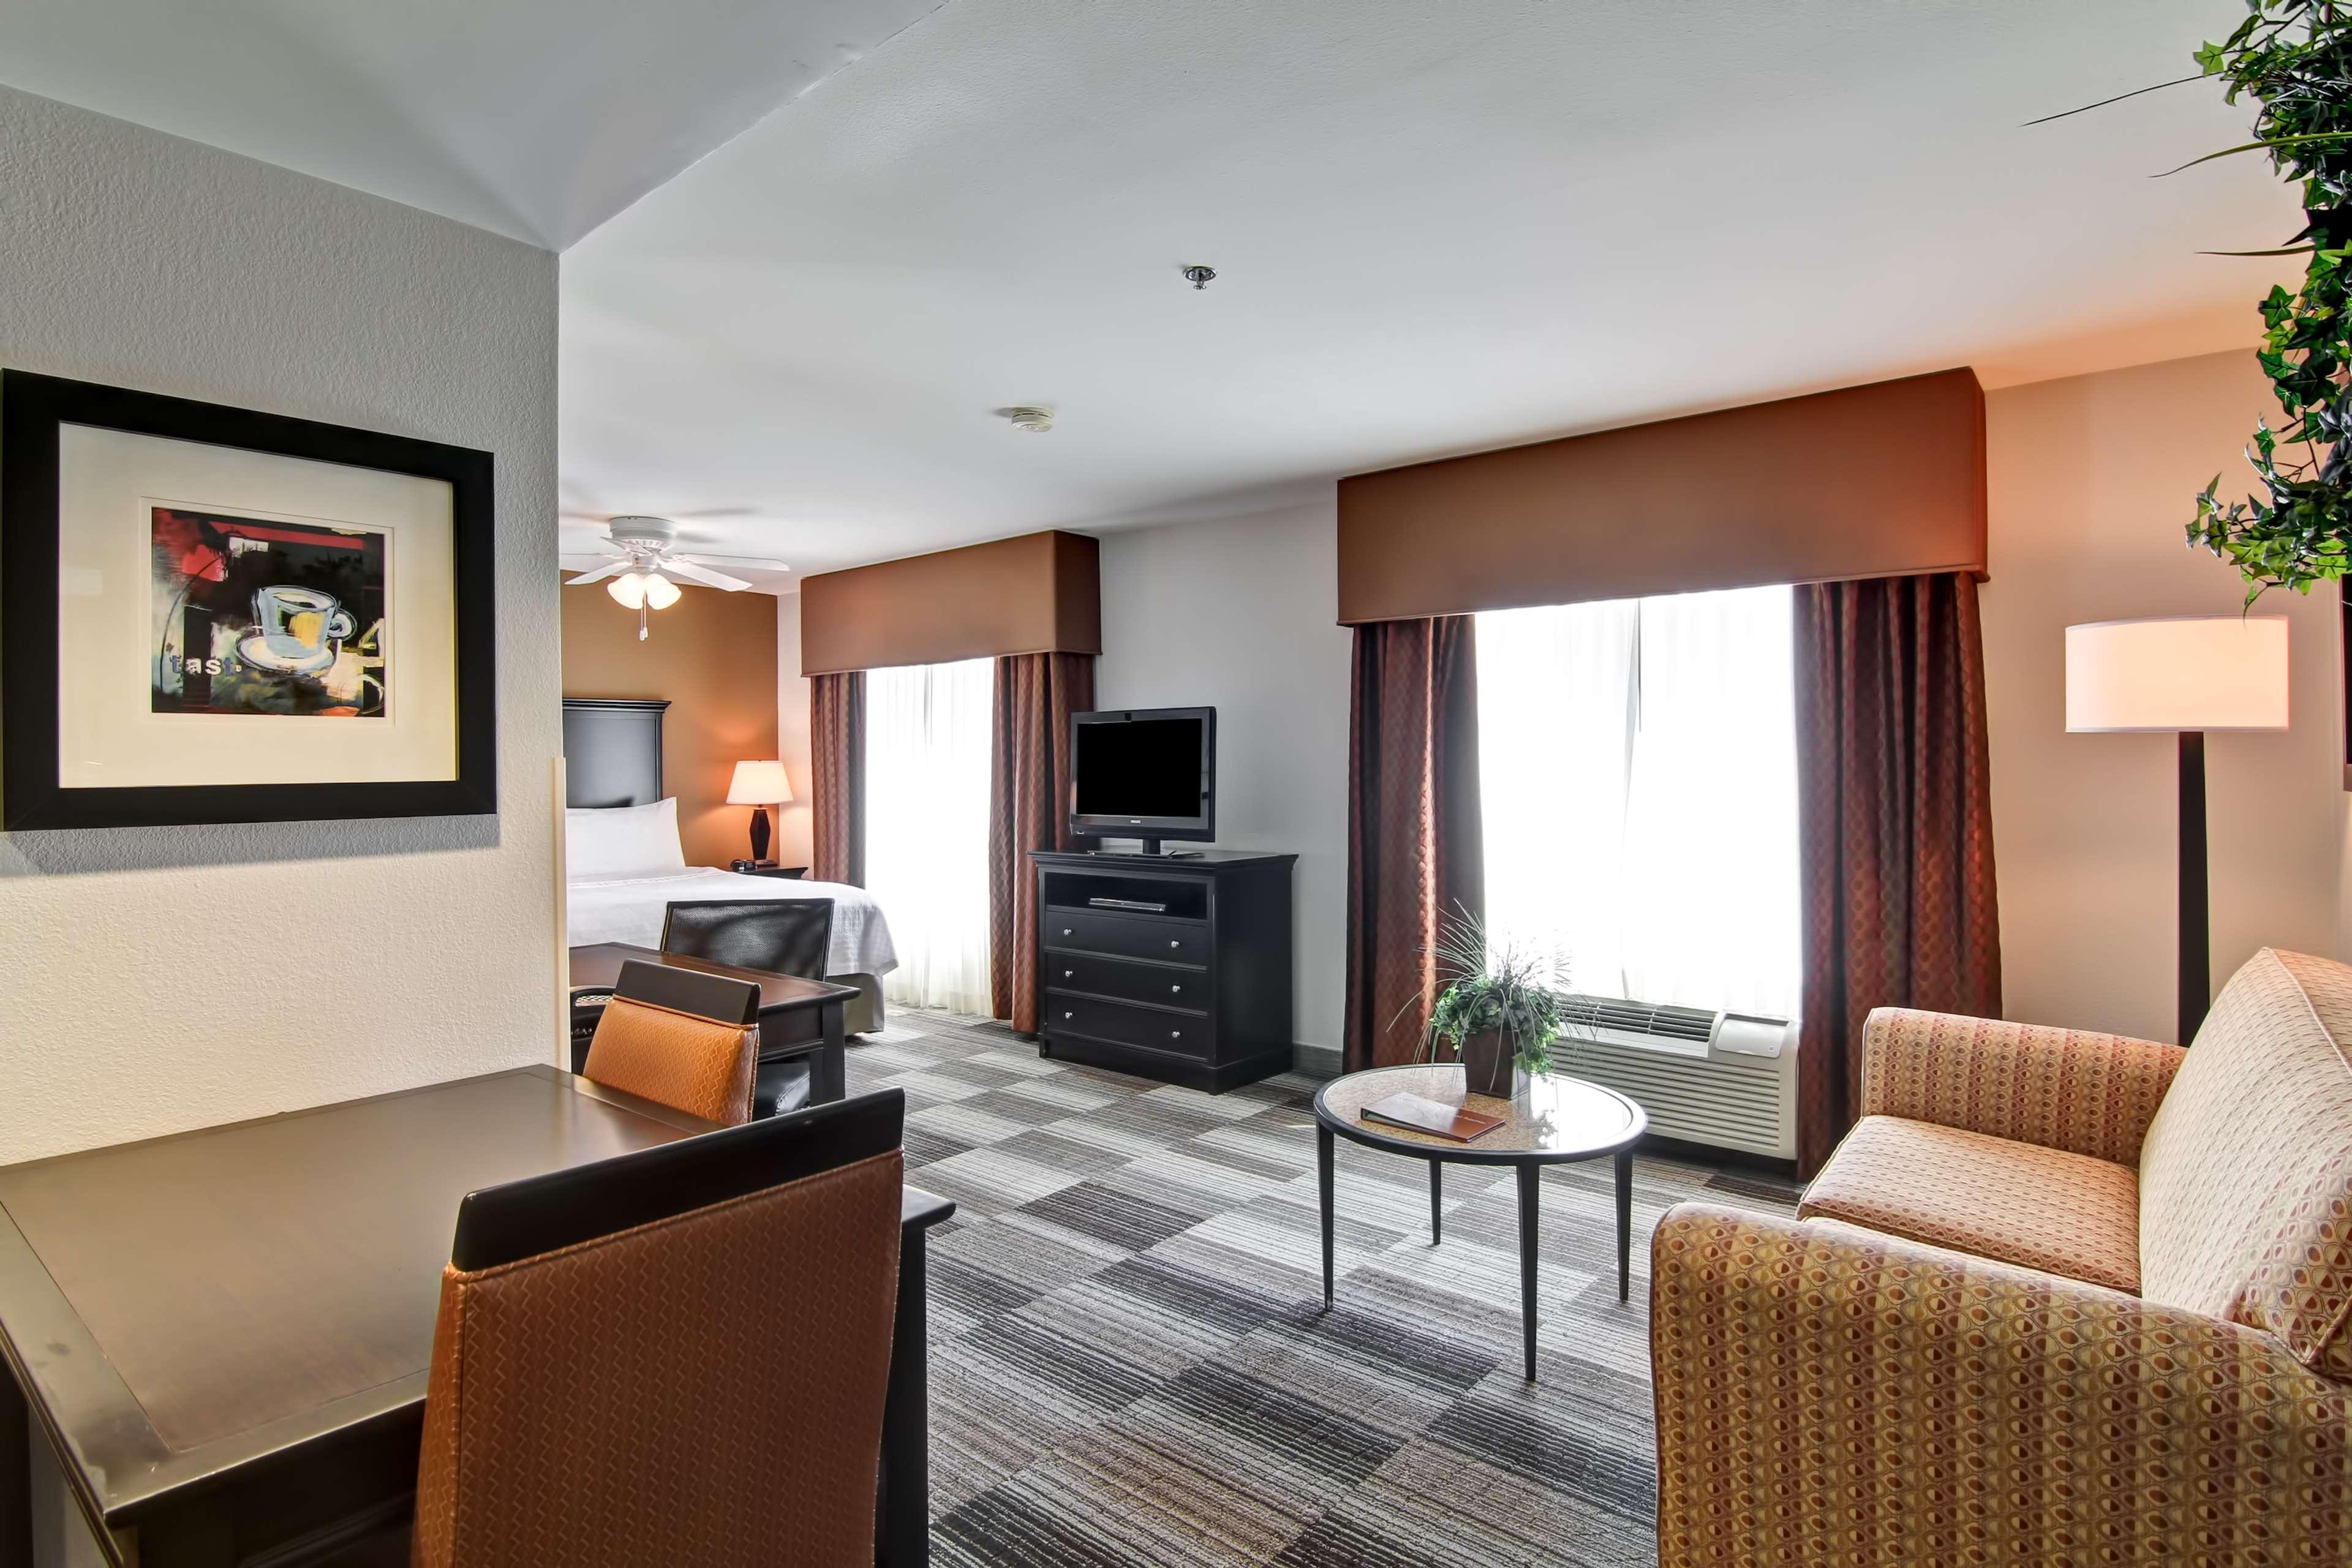 Homewood Suites by Hilton Cincinnati Airport South-Florence image 32